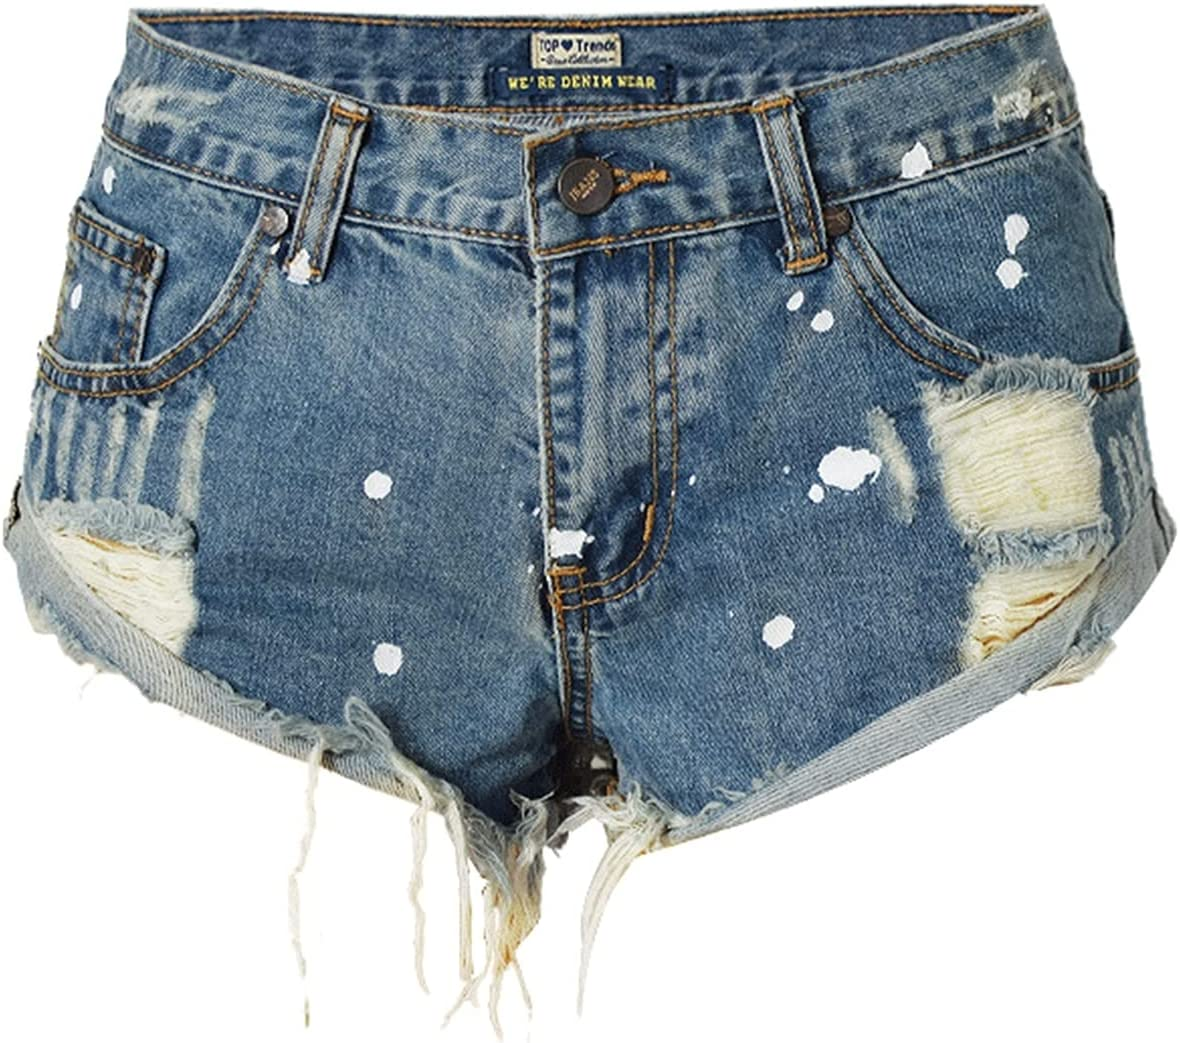 SBCDY Women's Destroyed Ripped Hole Denim Shorts Sexy Short Jeans Summer High Waist Denim Shorts Hole Tear Tassel Denim Shorts (Color : Blue, Size : 42)